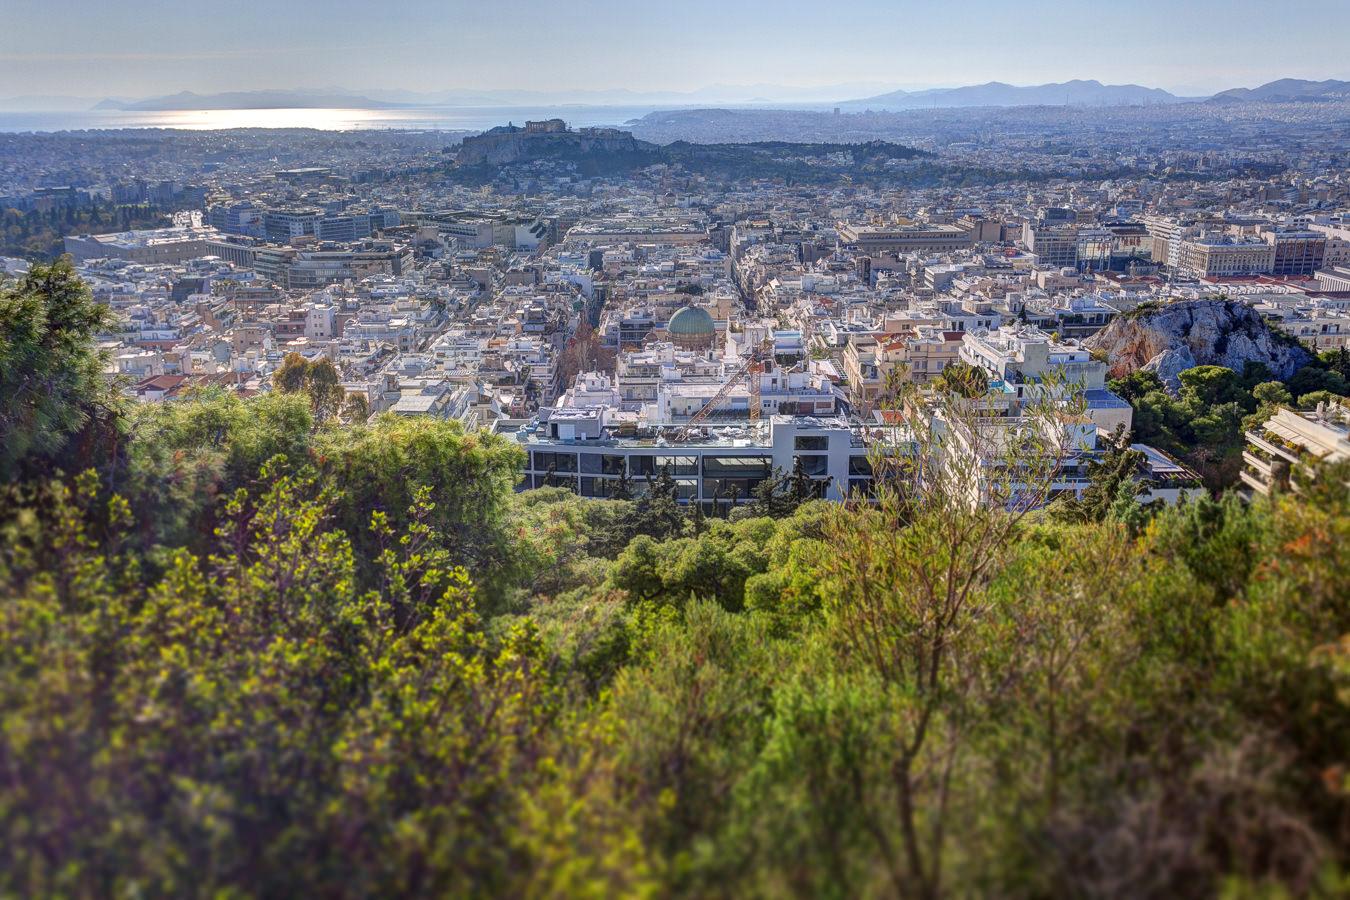 One Athens - Memory Alteration, Γιώργος Φάκαρος - Αρχιτεκτονική Φωτογραφία | Εσωτερικοί Χώροι | Φωτογραφία Ξενοδοχειών - Photography / Φωτογραφία